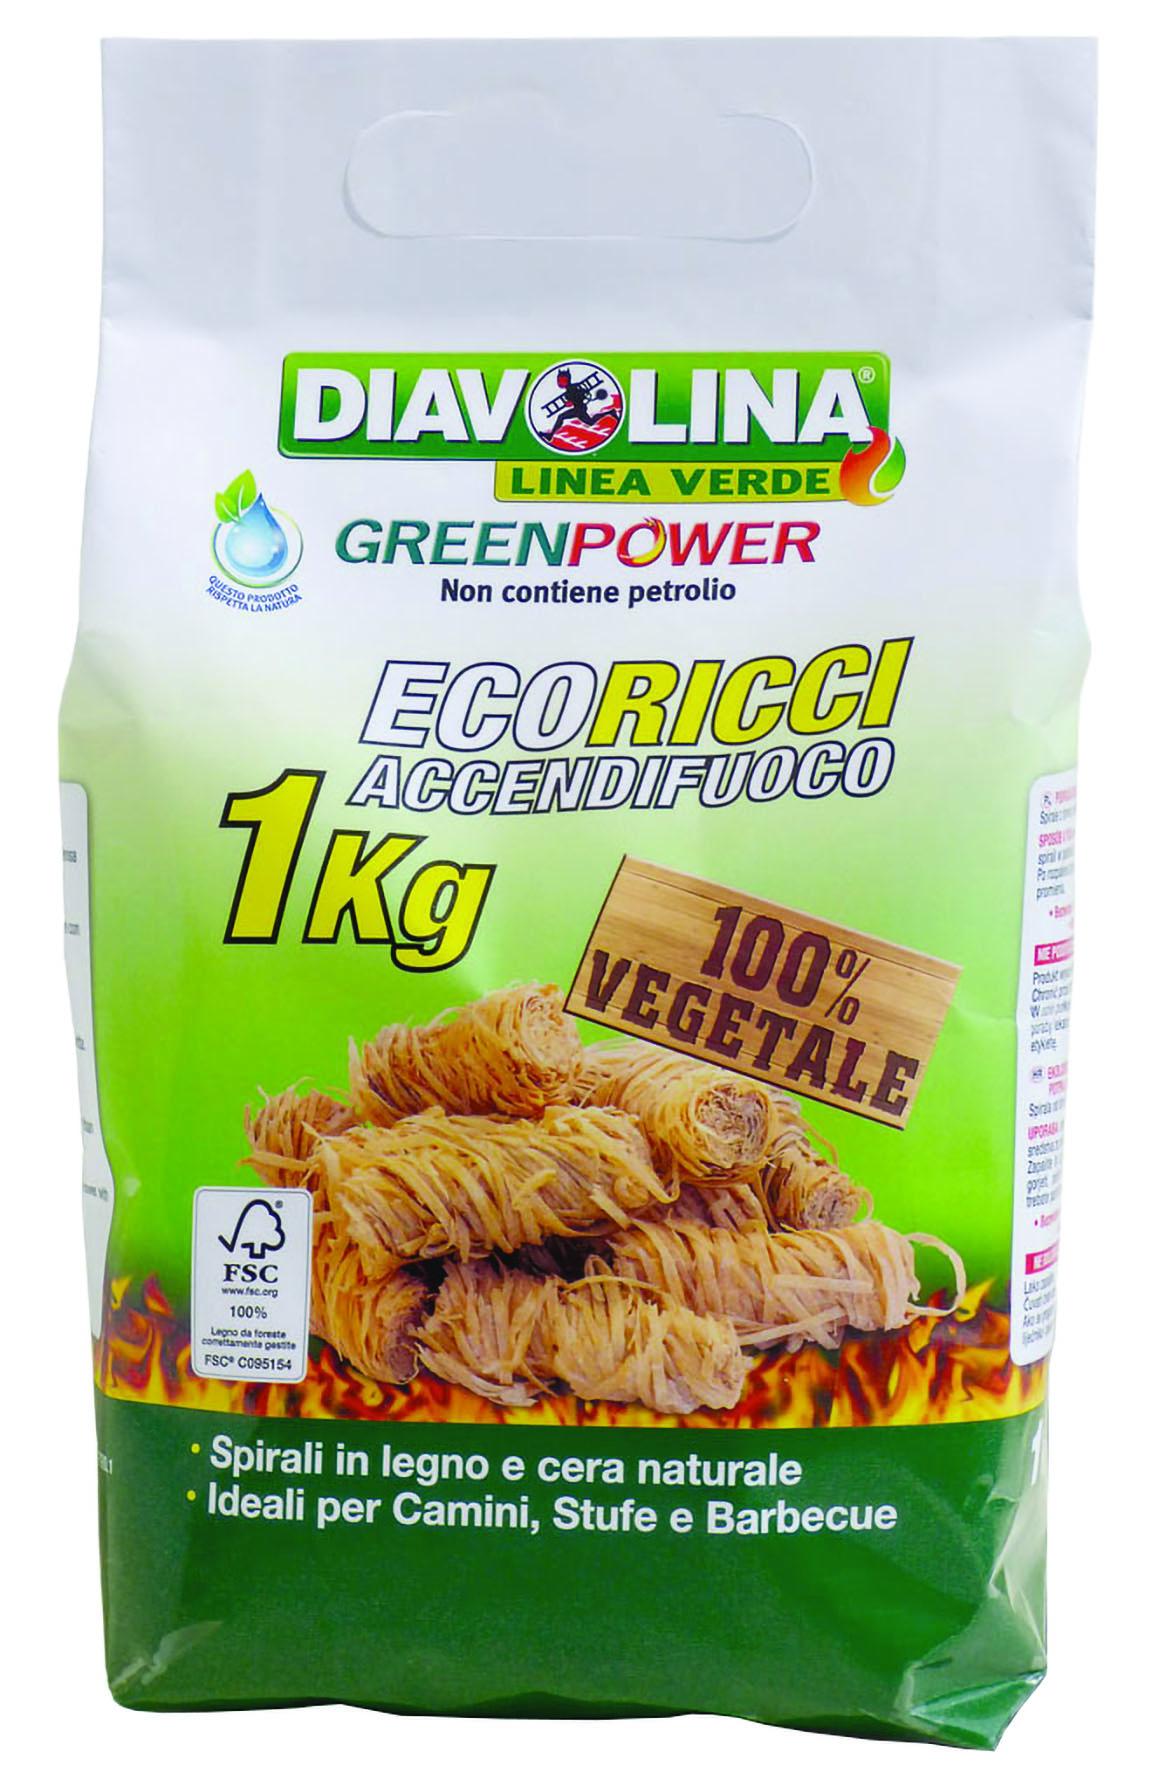 diavolina-eco-ricci-1-kg